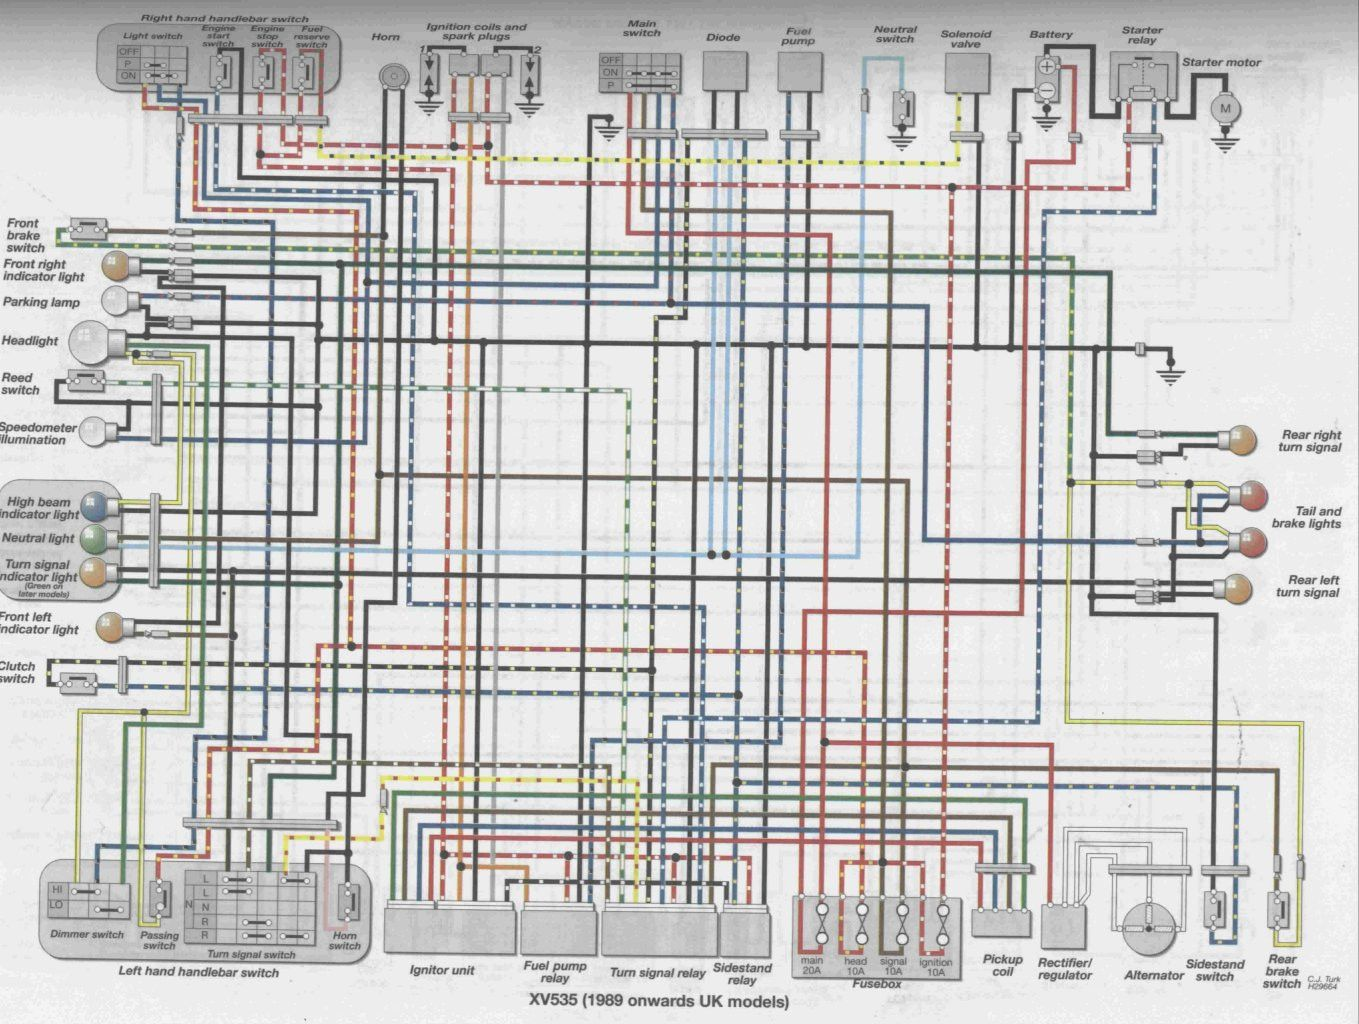 WD_0891] Xv535 Wiring Diagram Wiring DiagramNowa Hyedi Salv Mohammedshrine Librar Wiring 101